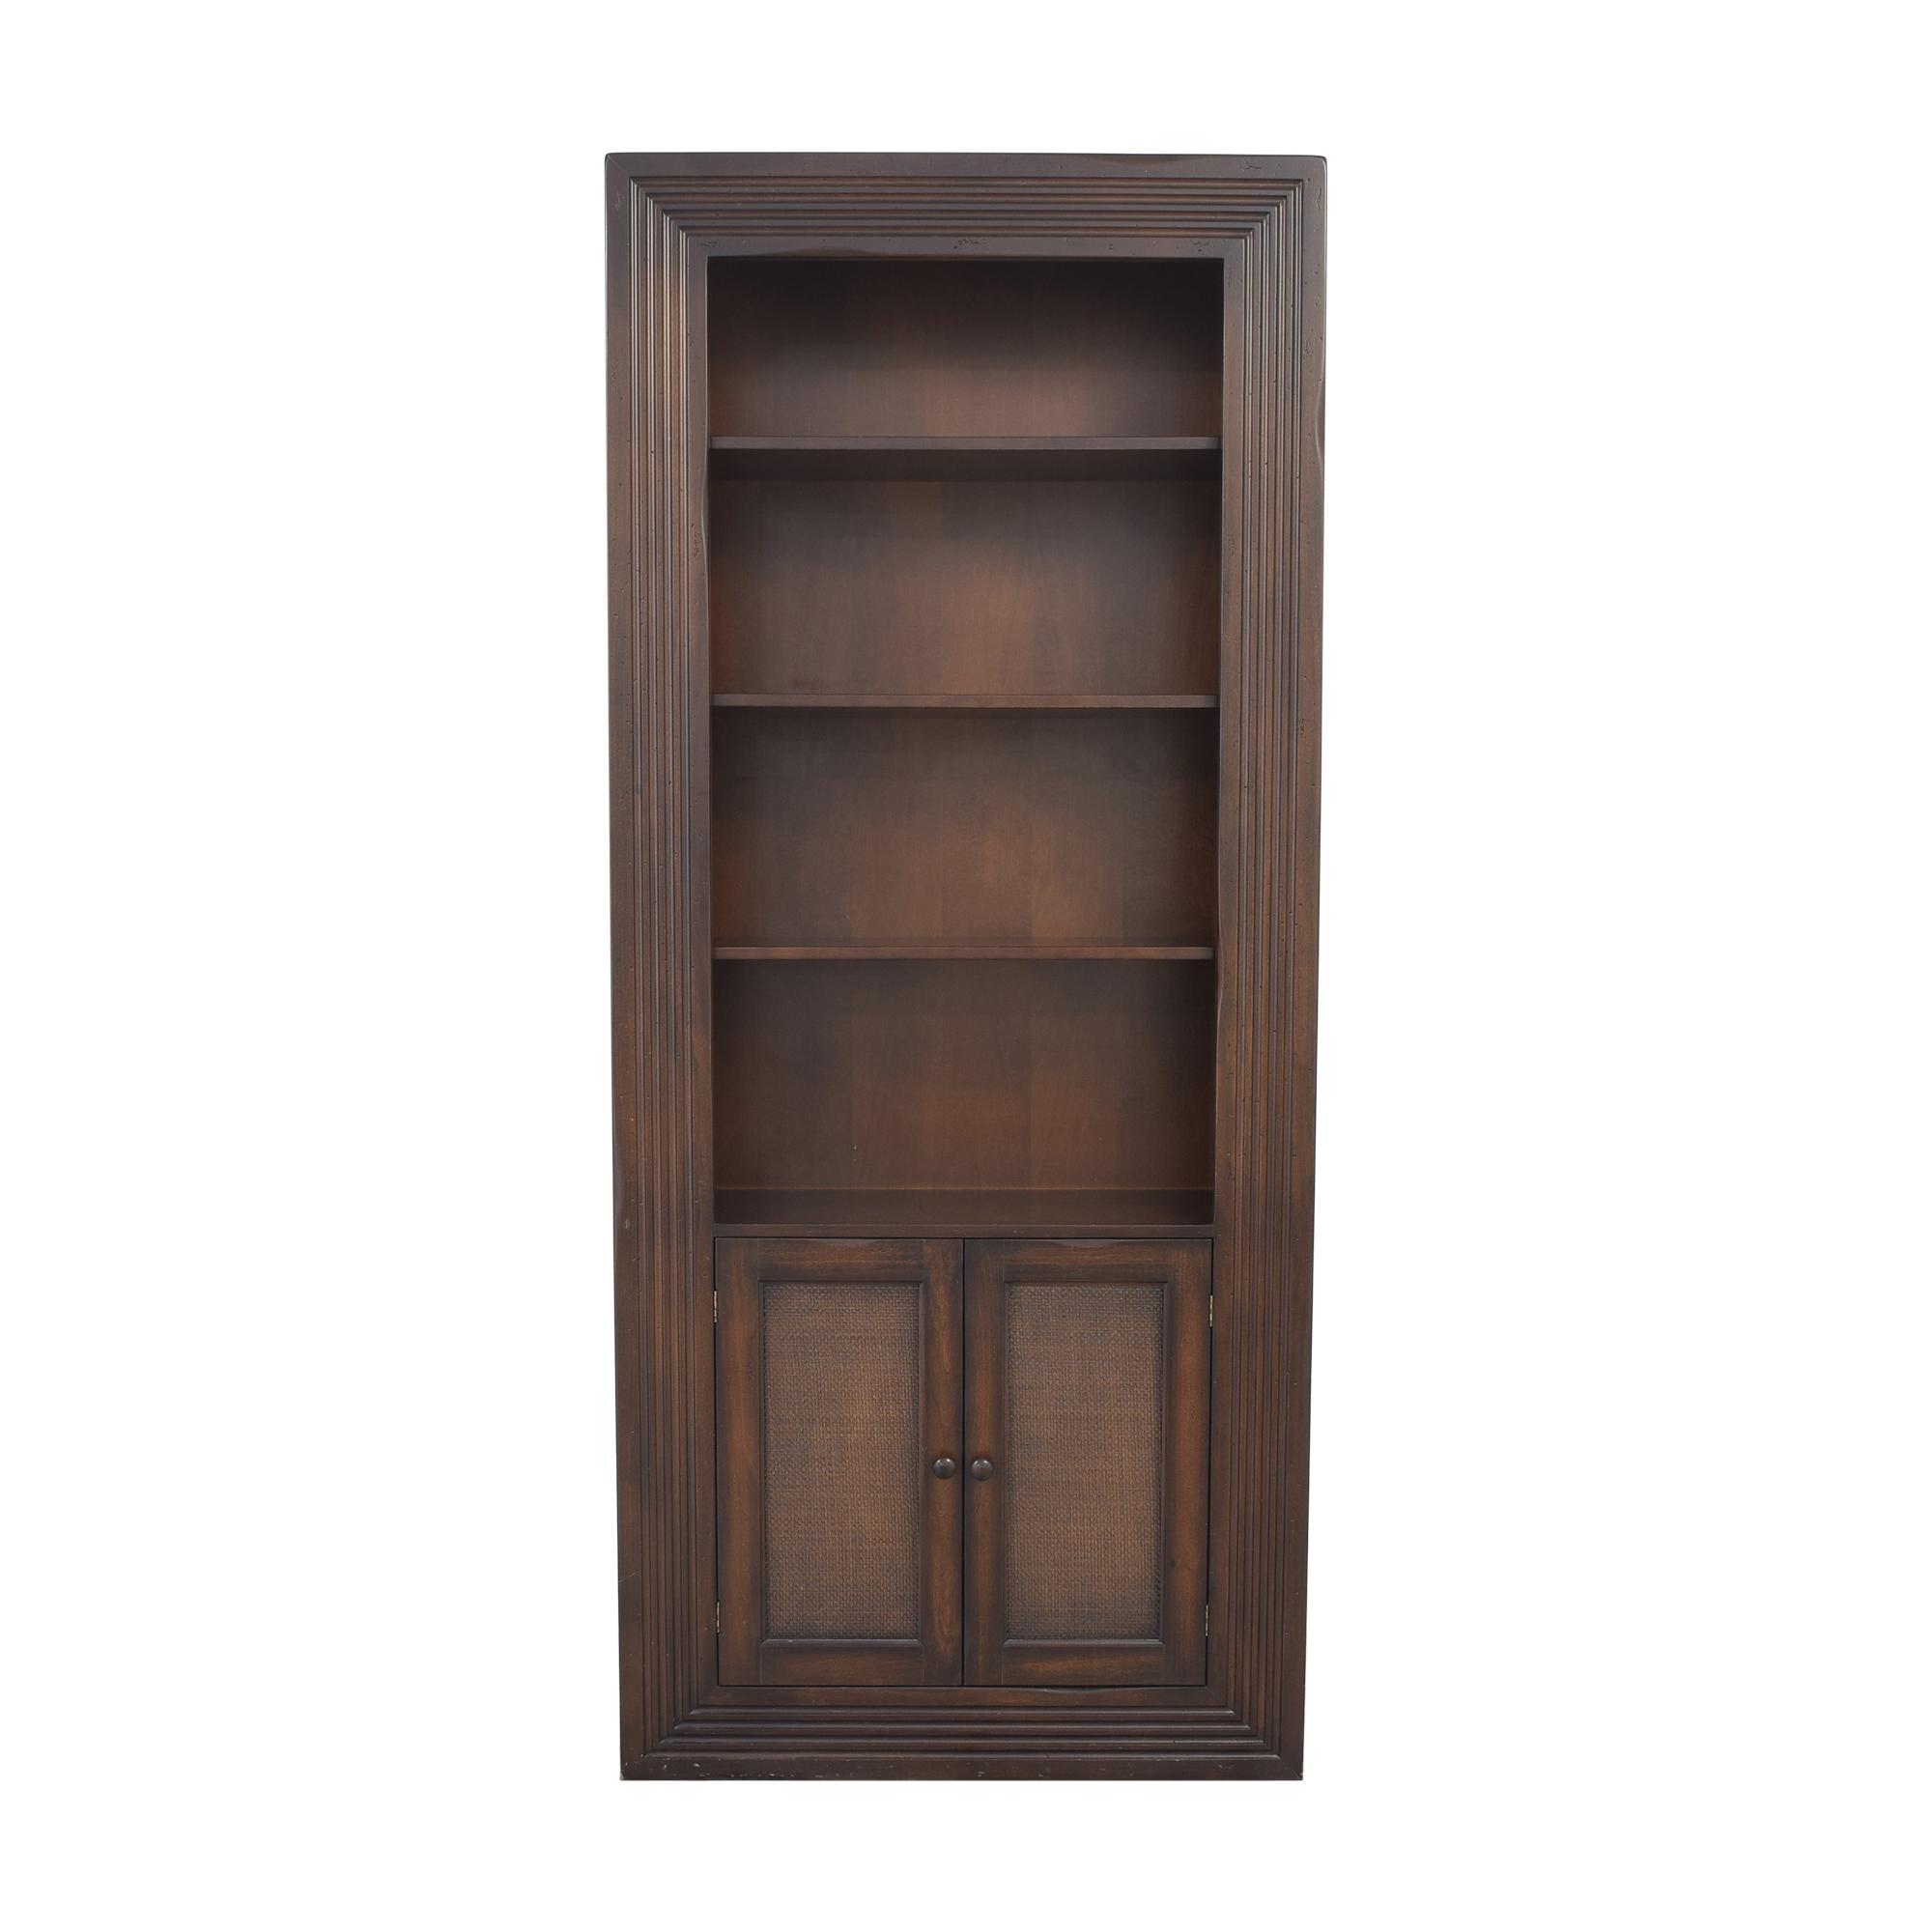 Bloomingdale's Bloomingdale's Bookcase Cabinet used